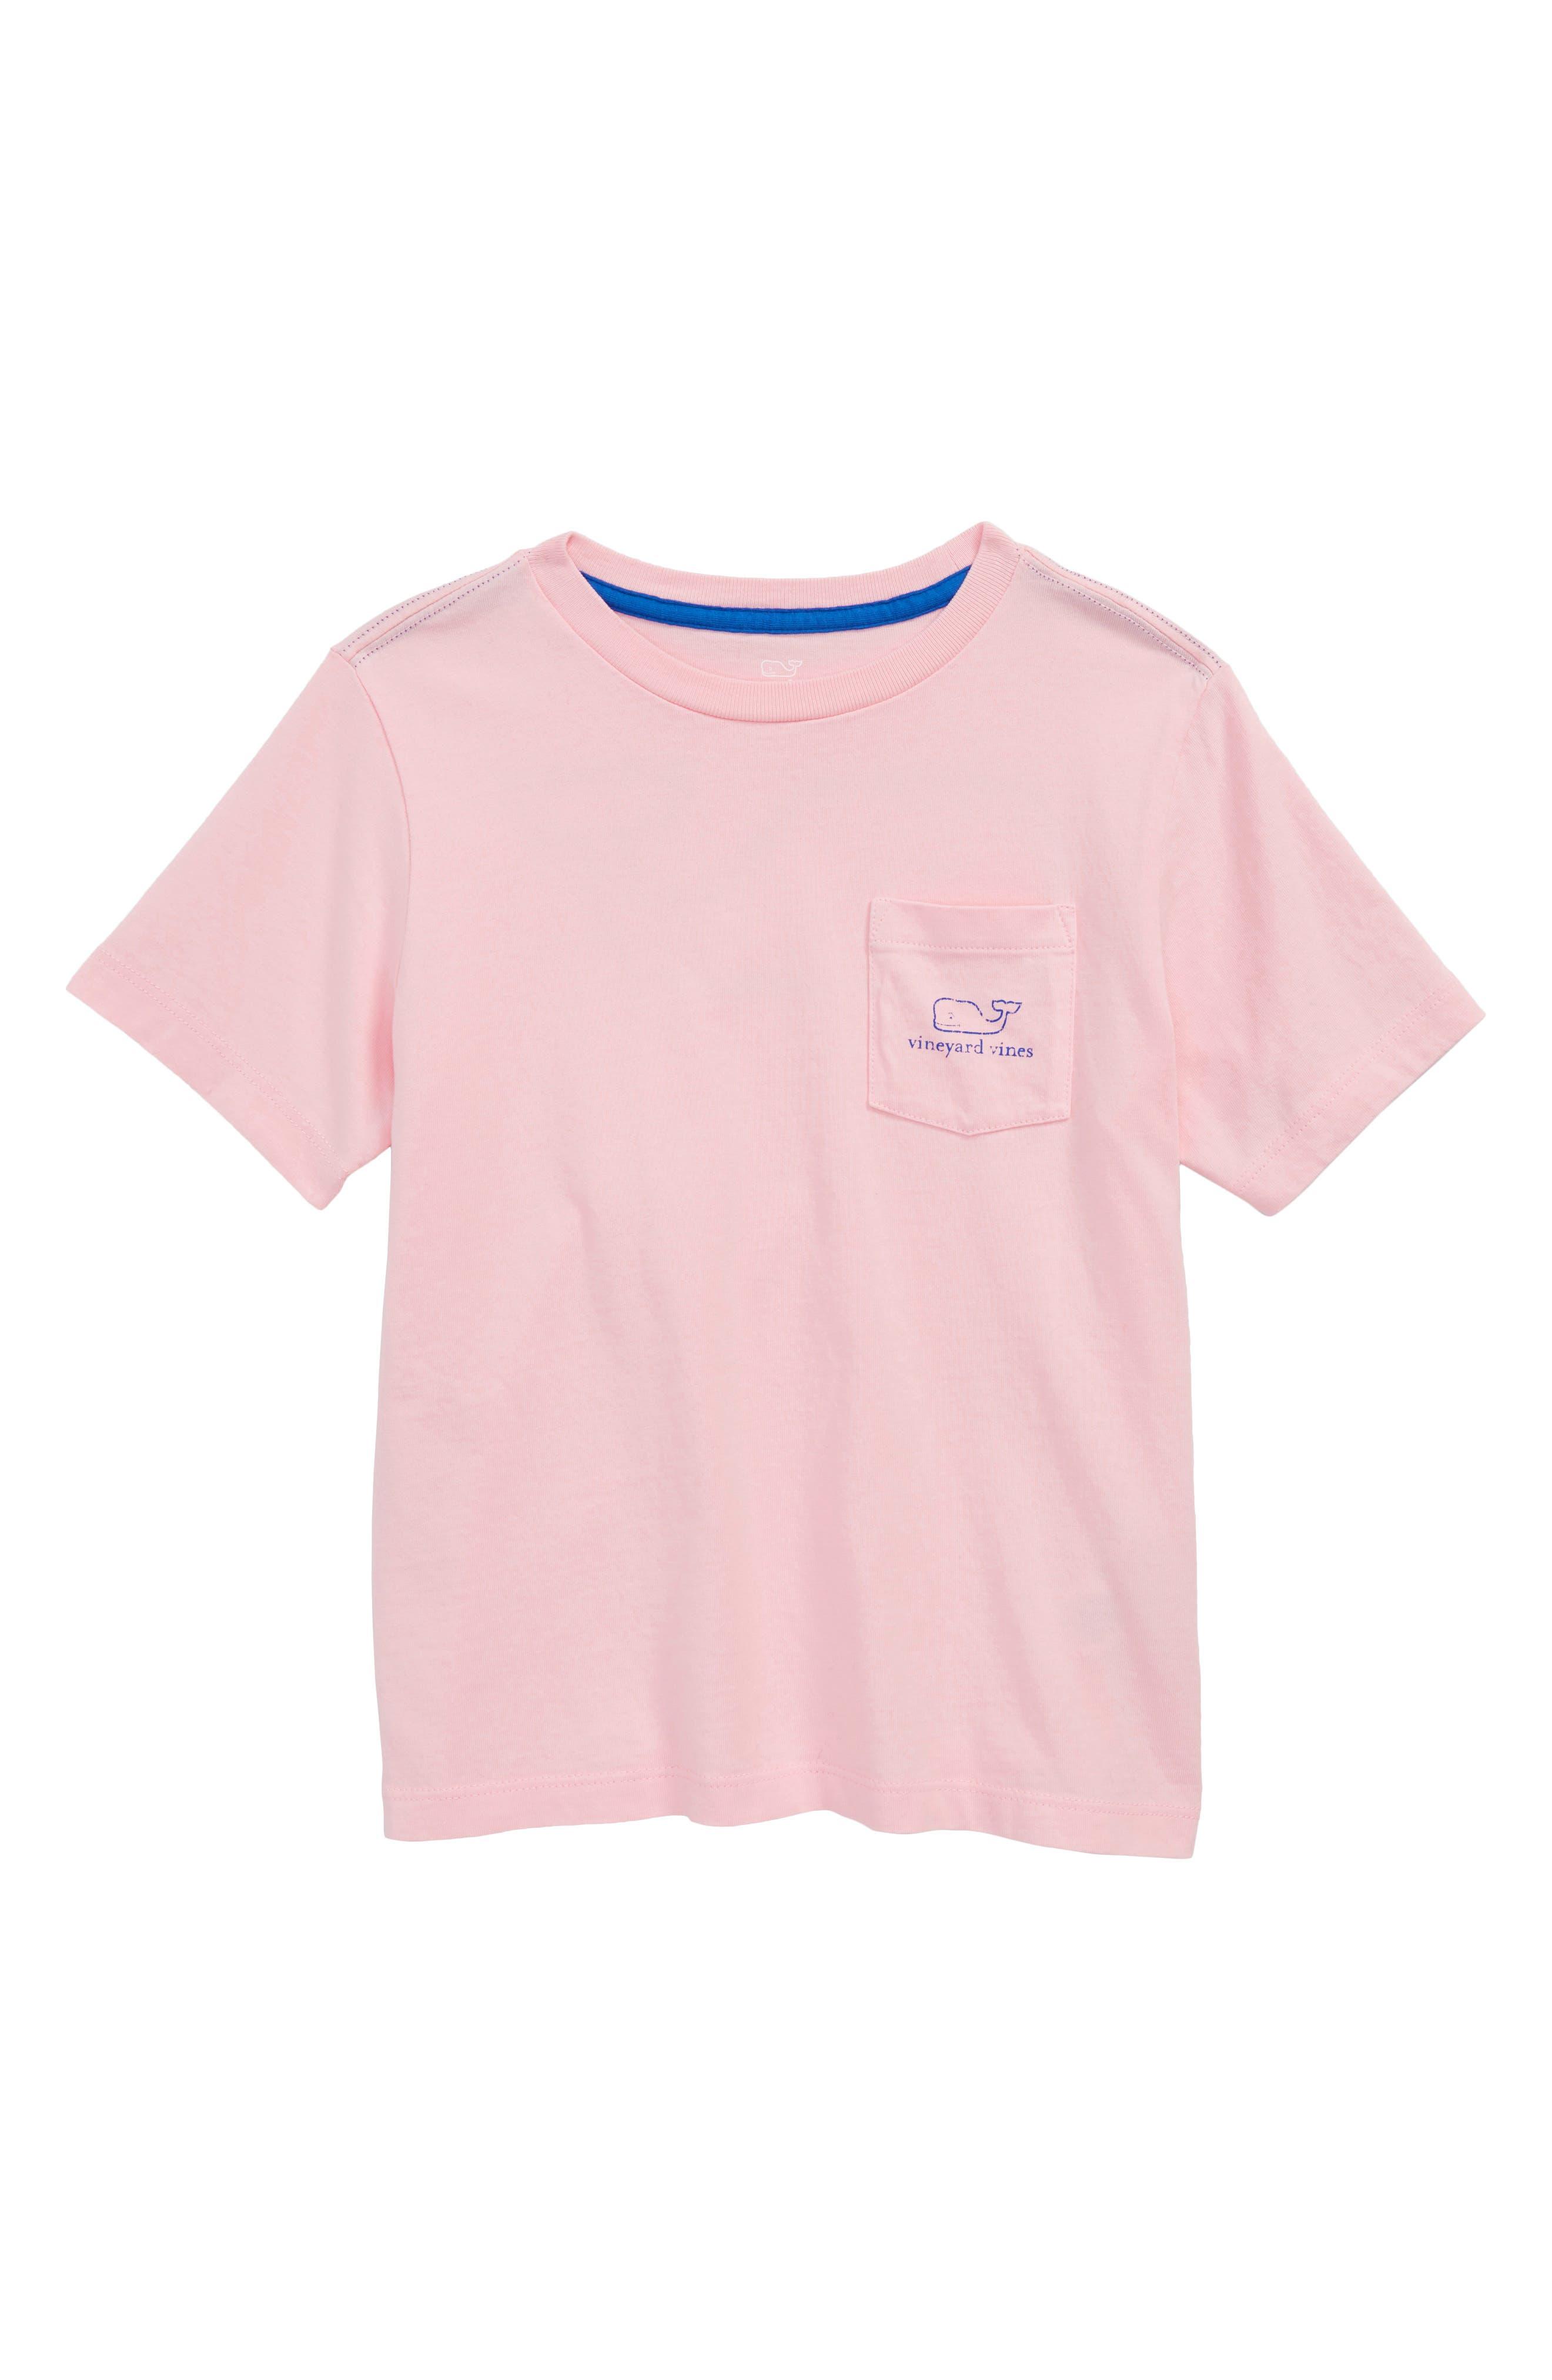 Whale T-Shirt,                             Main thumbnail 1, color,                             Flamingo